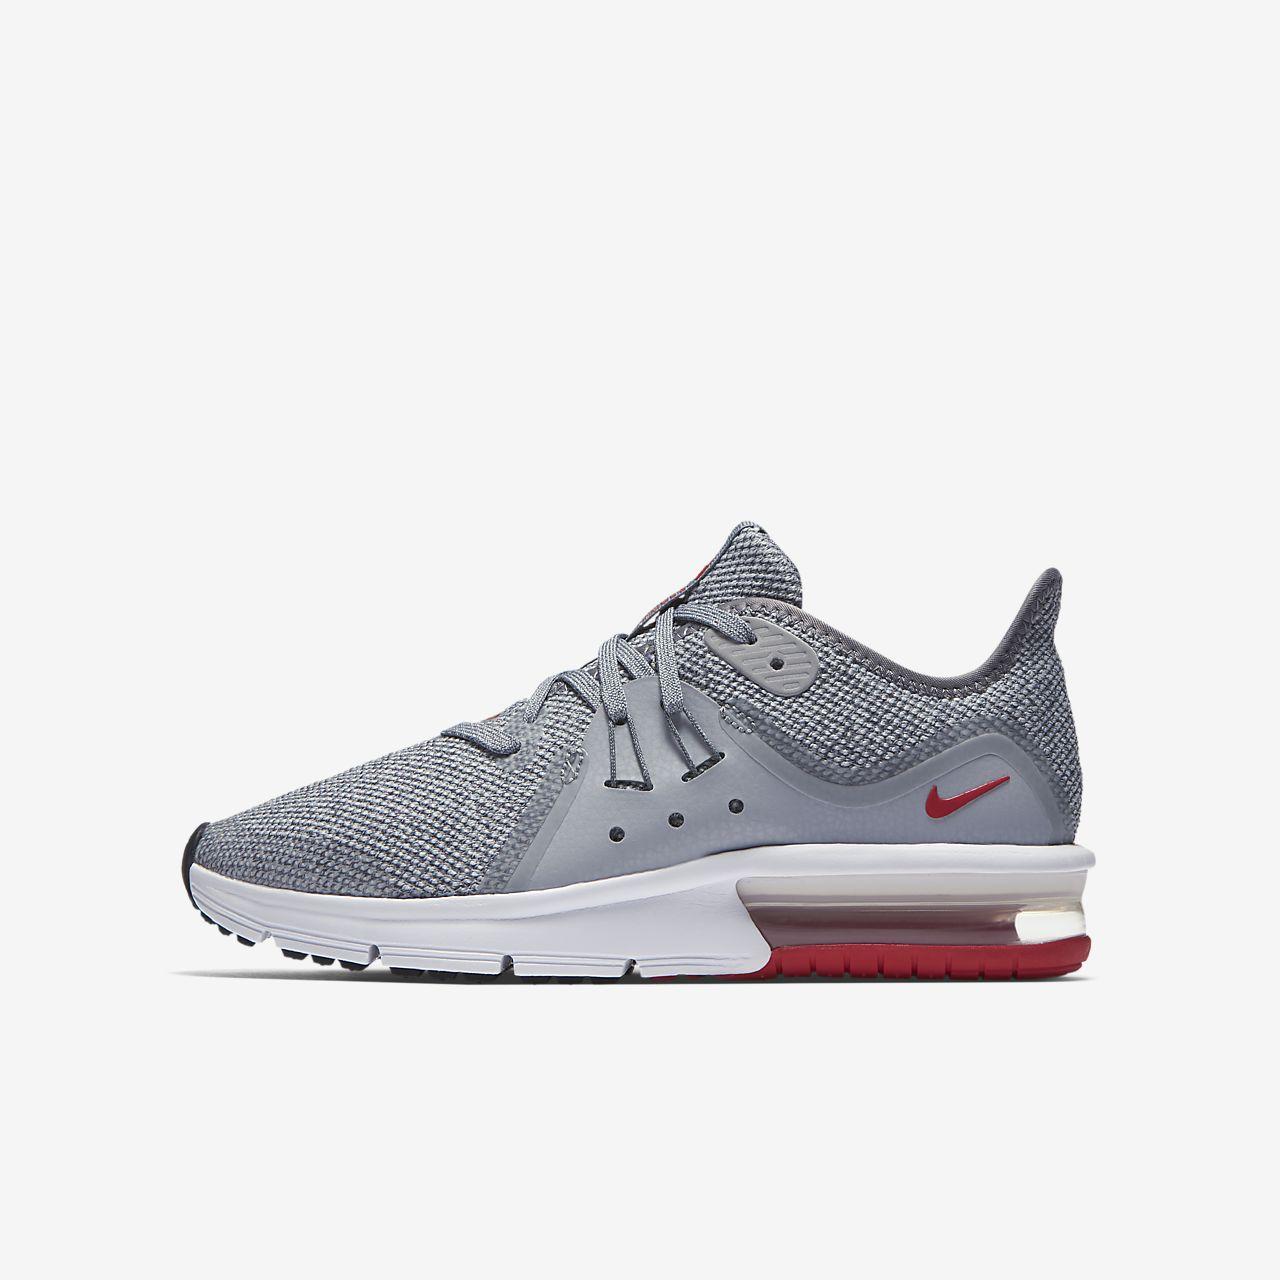 Sko Nike Air Max Sequent 3 för ungdom